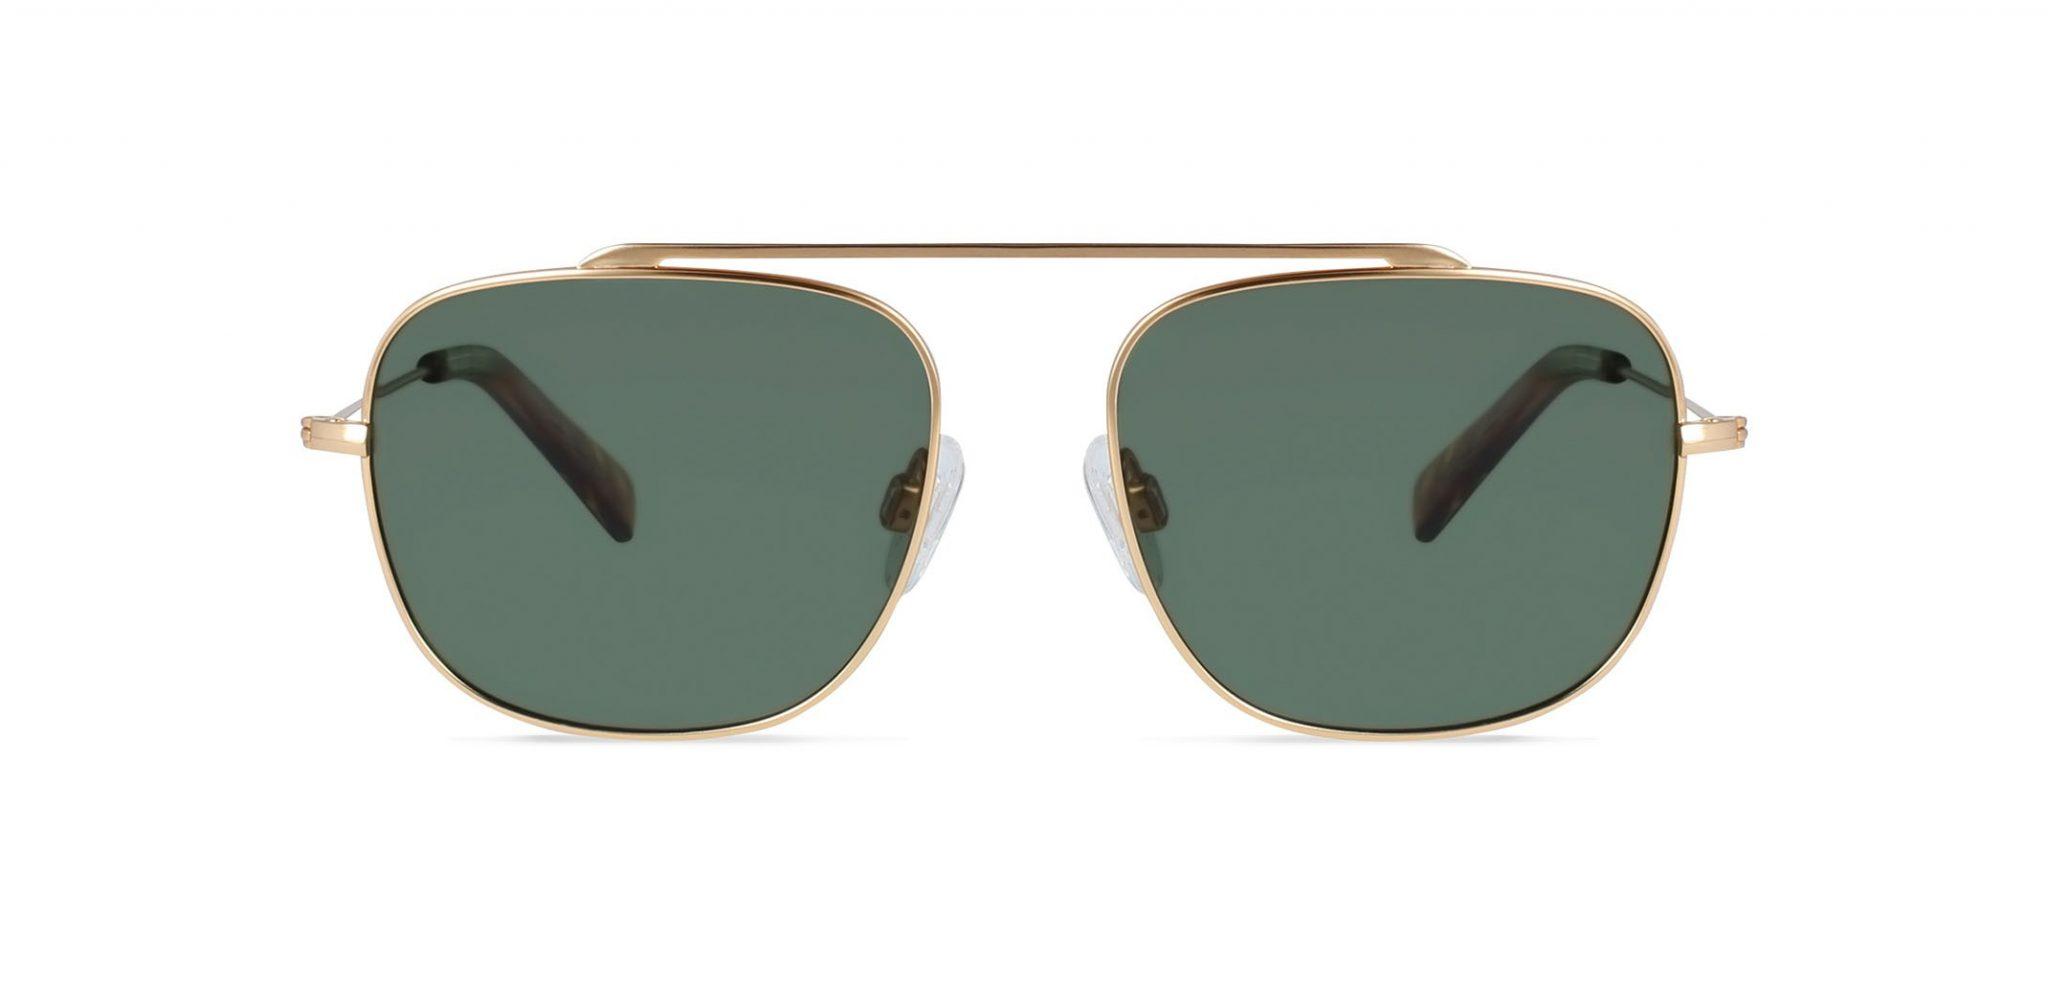 DiKA eyewear – Viper Sonnenbrille